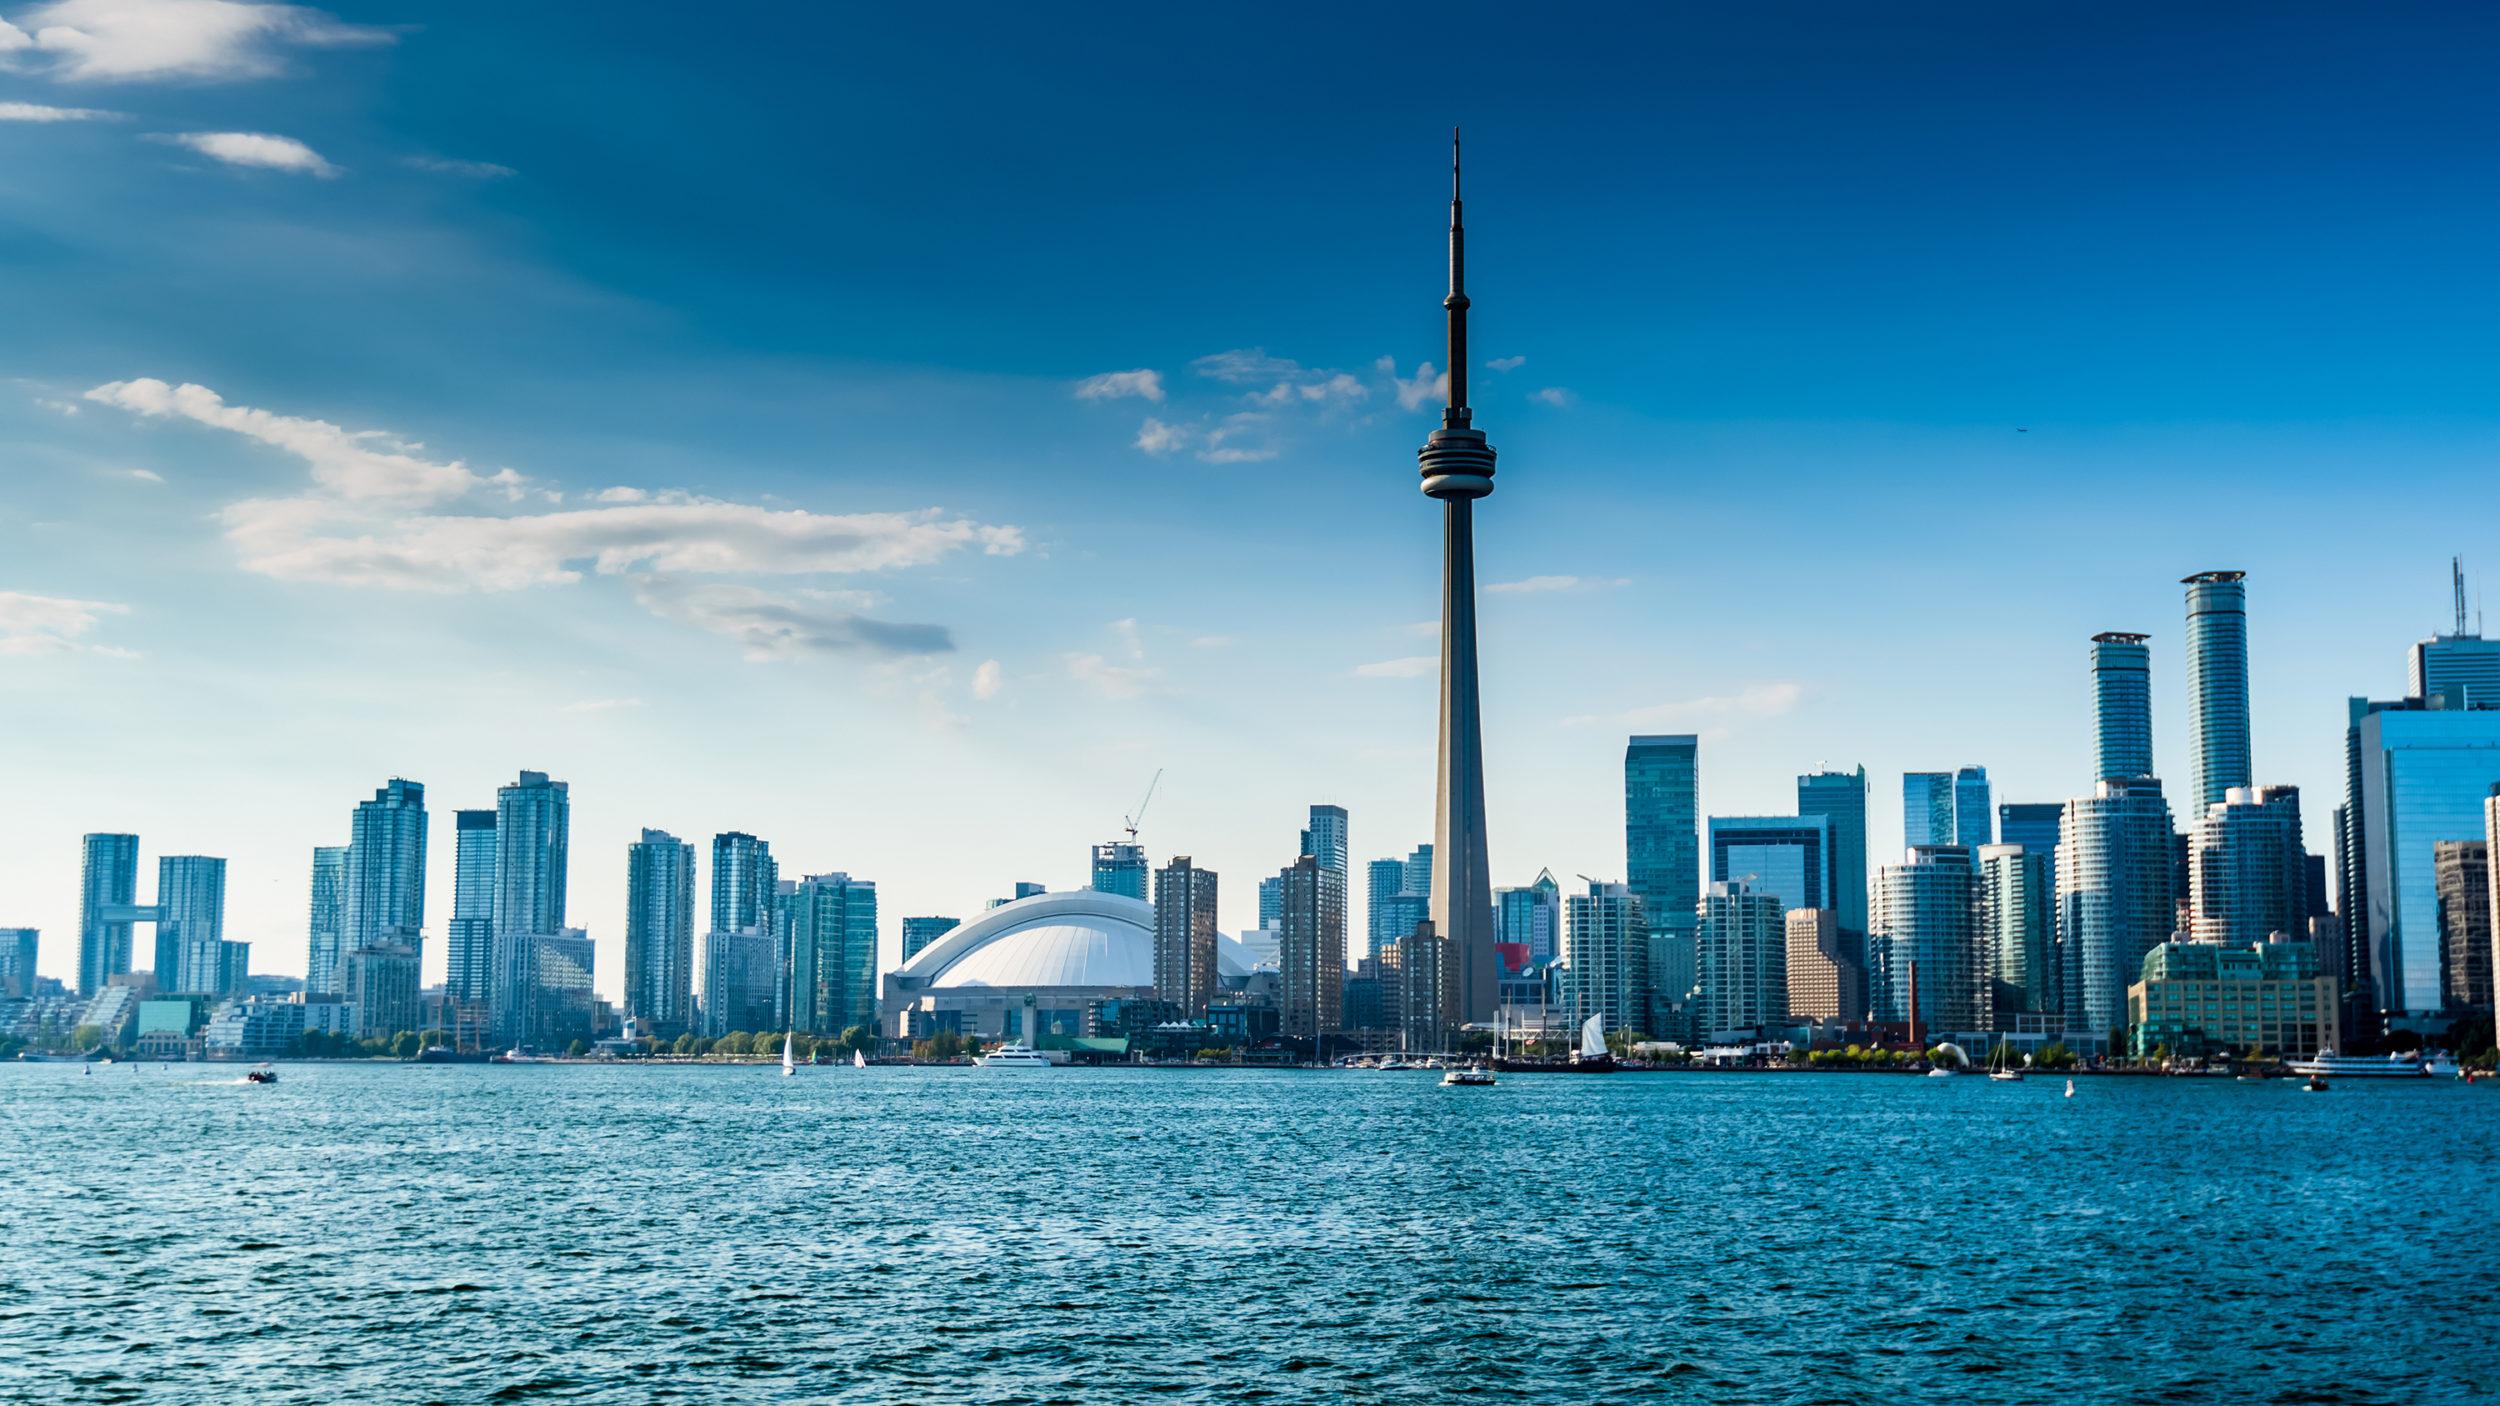 Canada [Shutterstock]